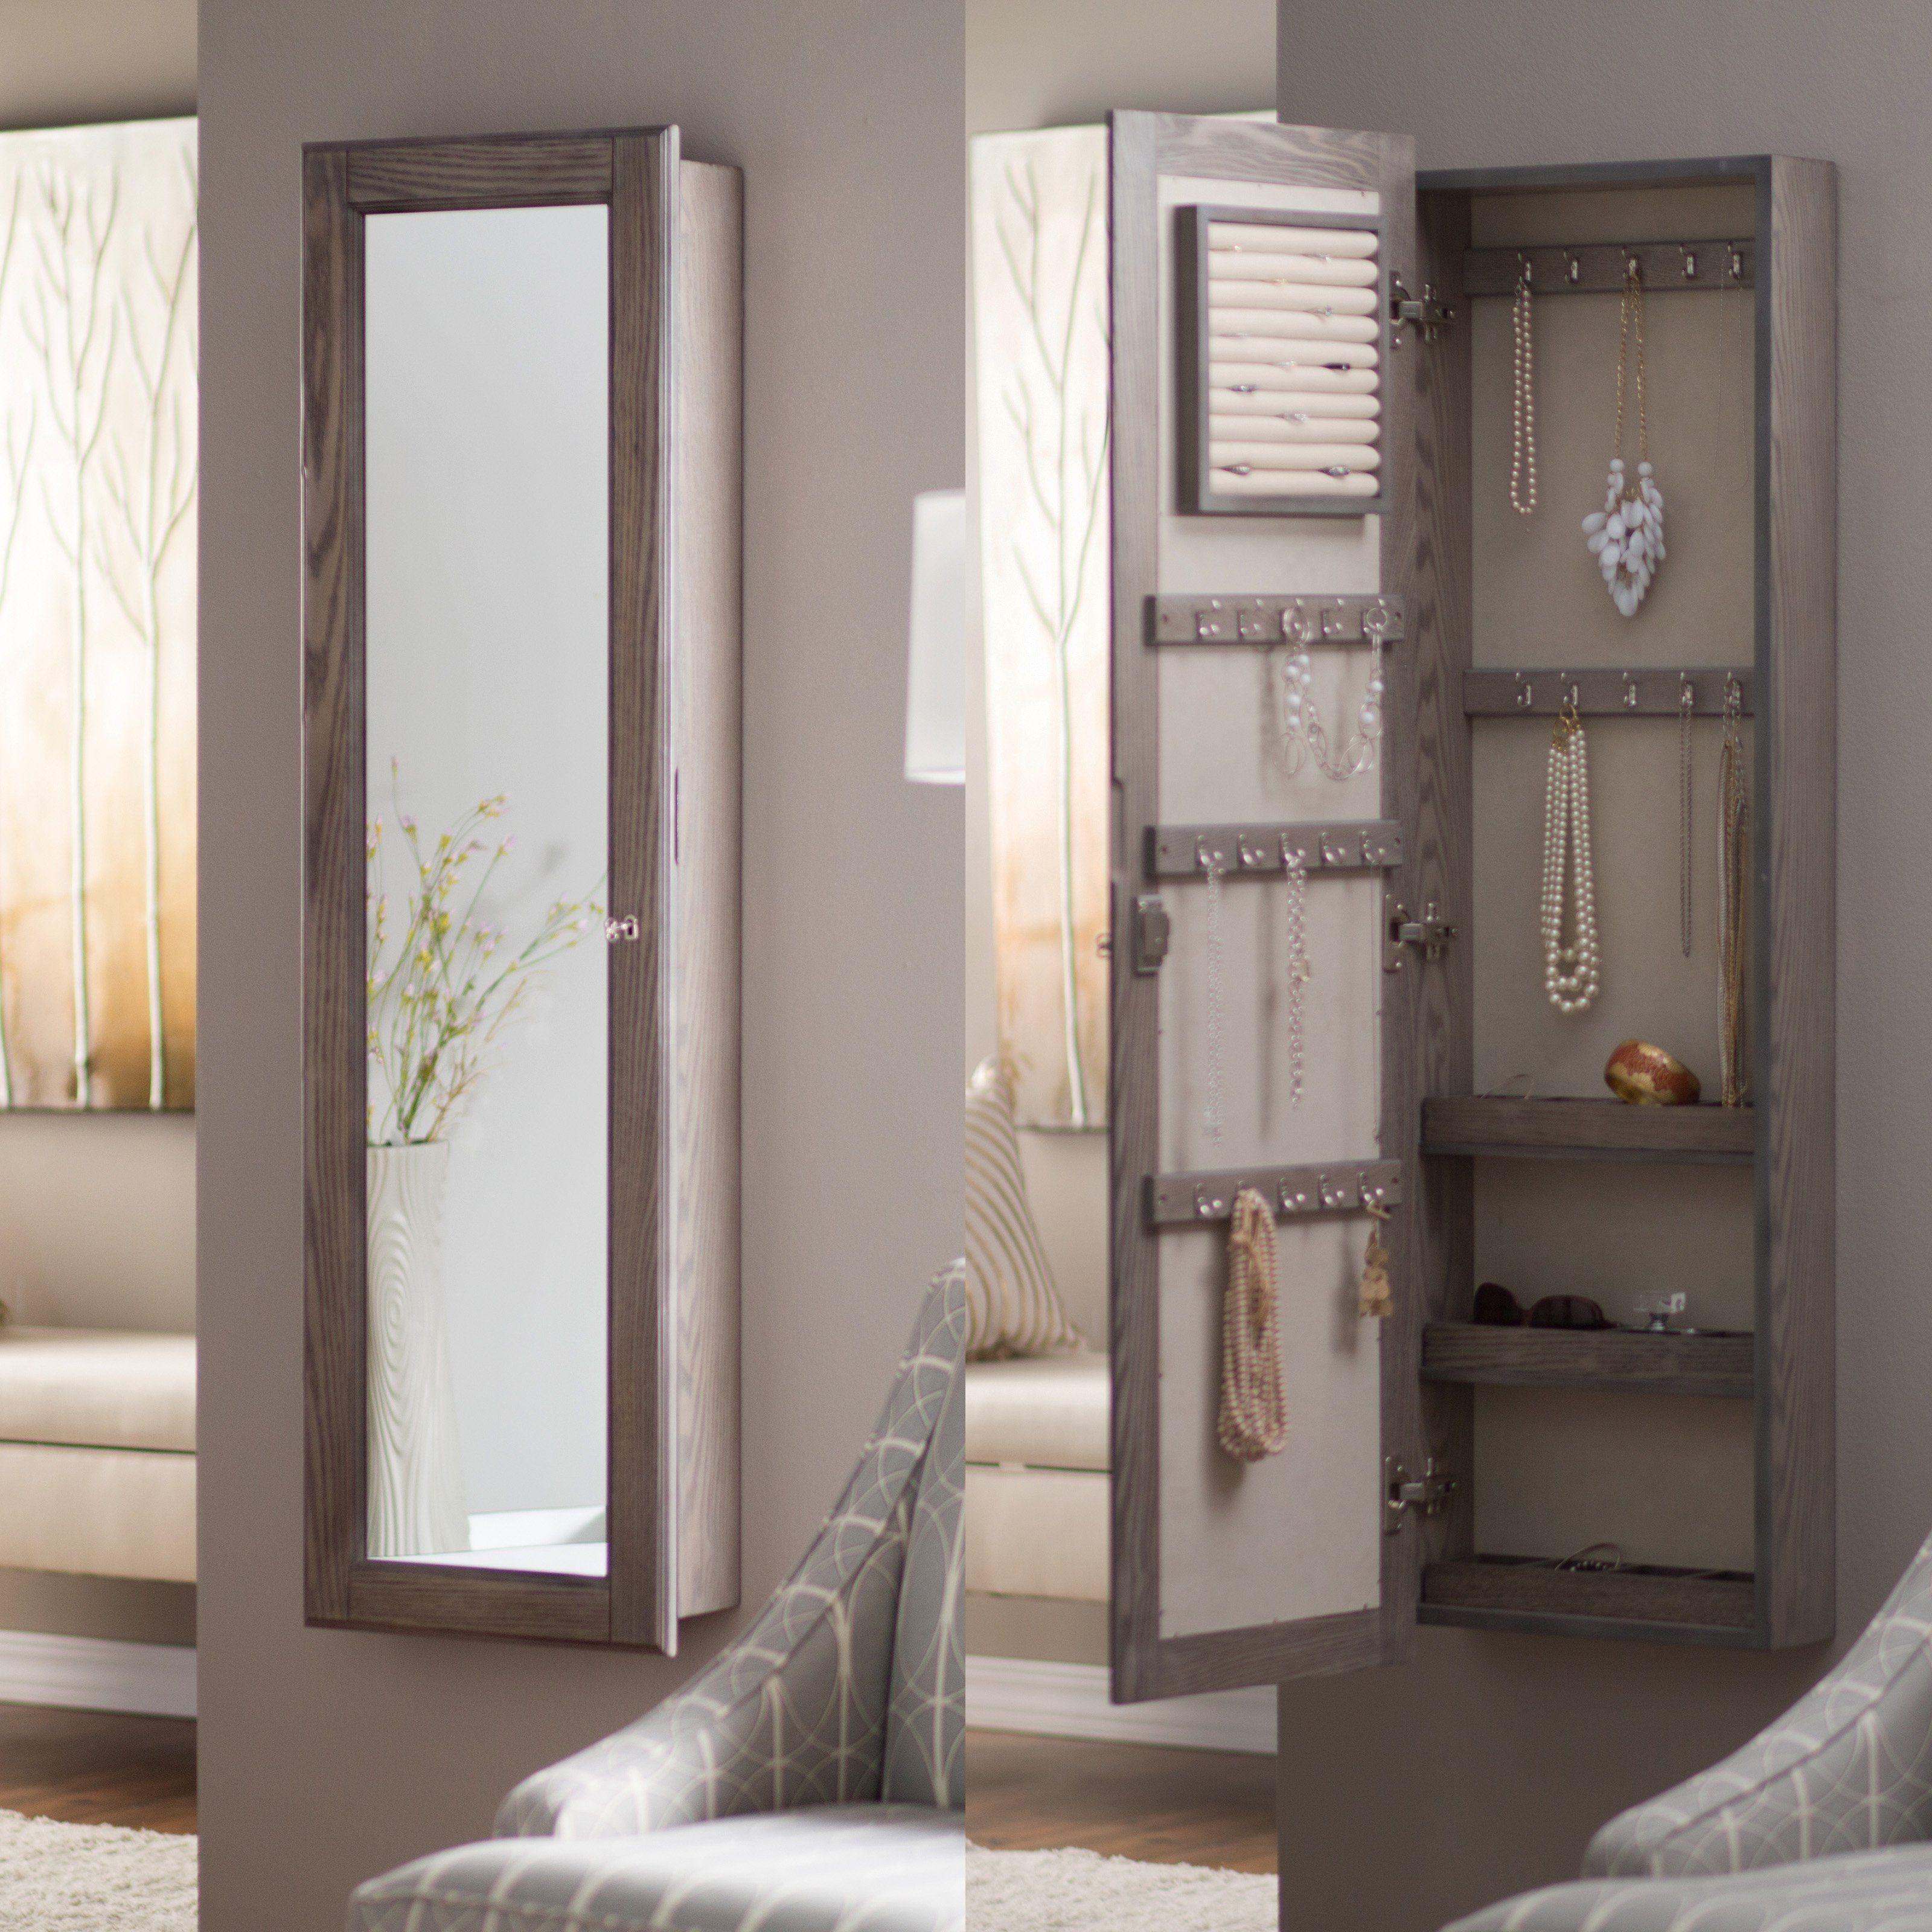 Wall Mounted Mirror Jewellery Cabinet httpdrrwus Pinterest